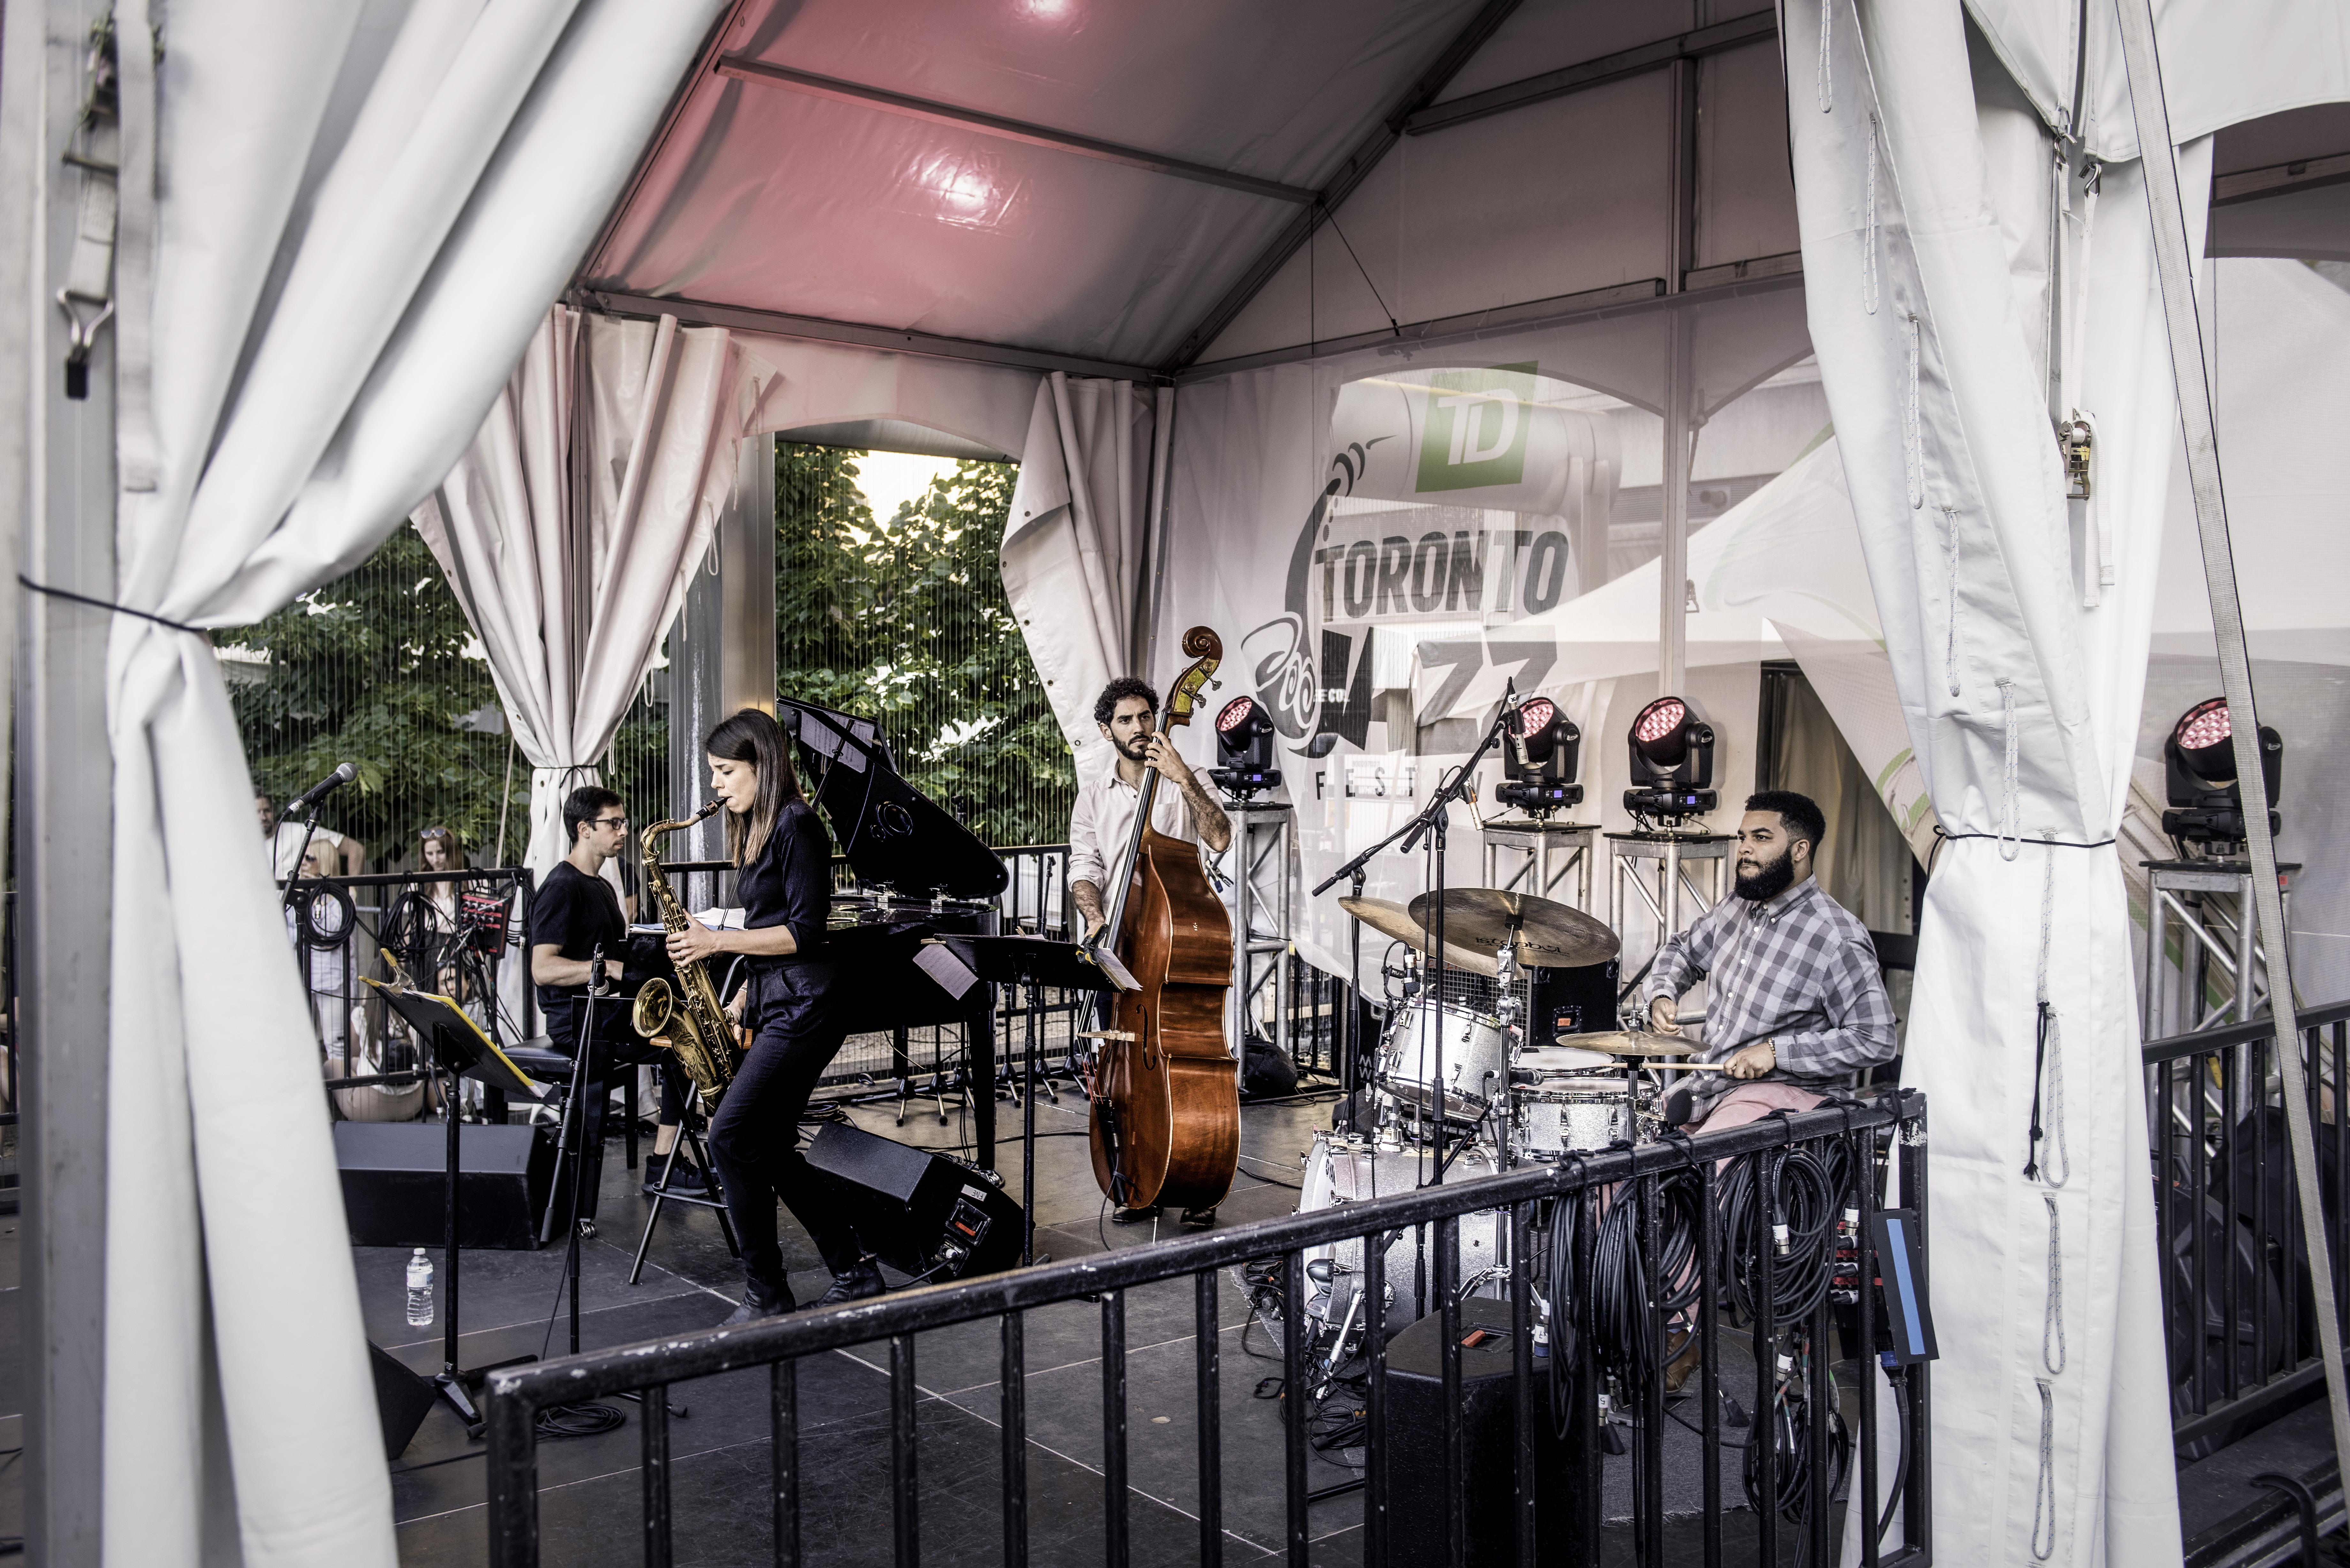 Sam Harris, Pablo Menares, Melissa Aldana and Kush Abadey at the Toronto Jazz Festival 2019